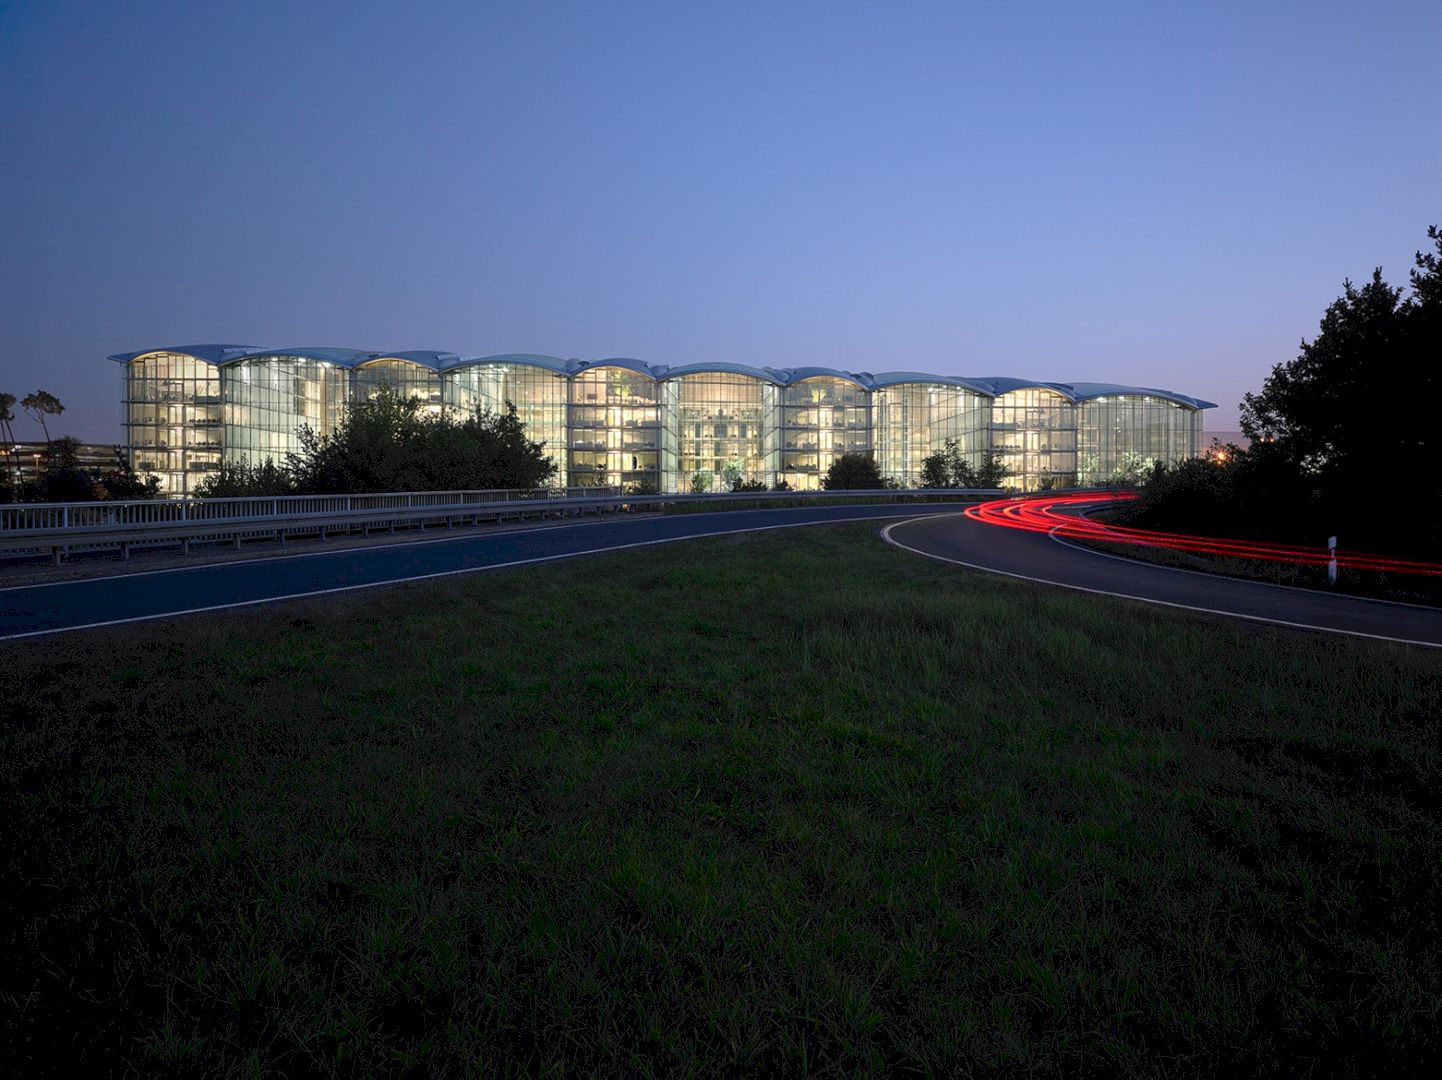 Lufthansa Aviation Center Frankfurt By Ingenhoven Architects 1